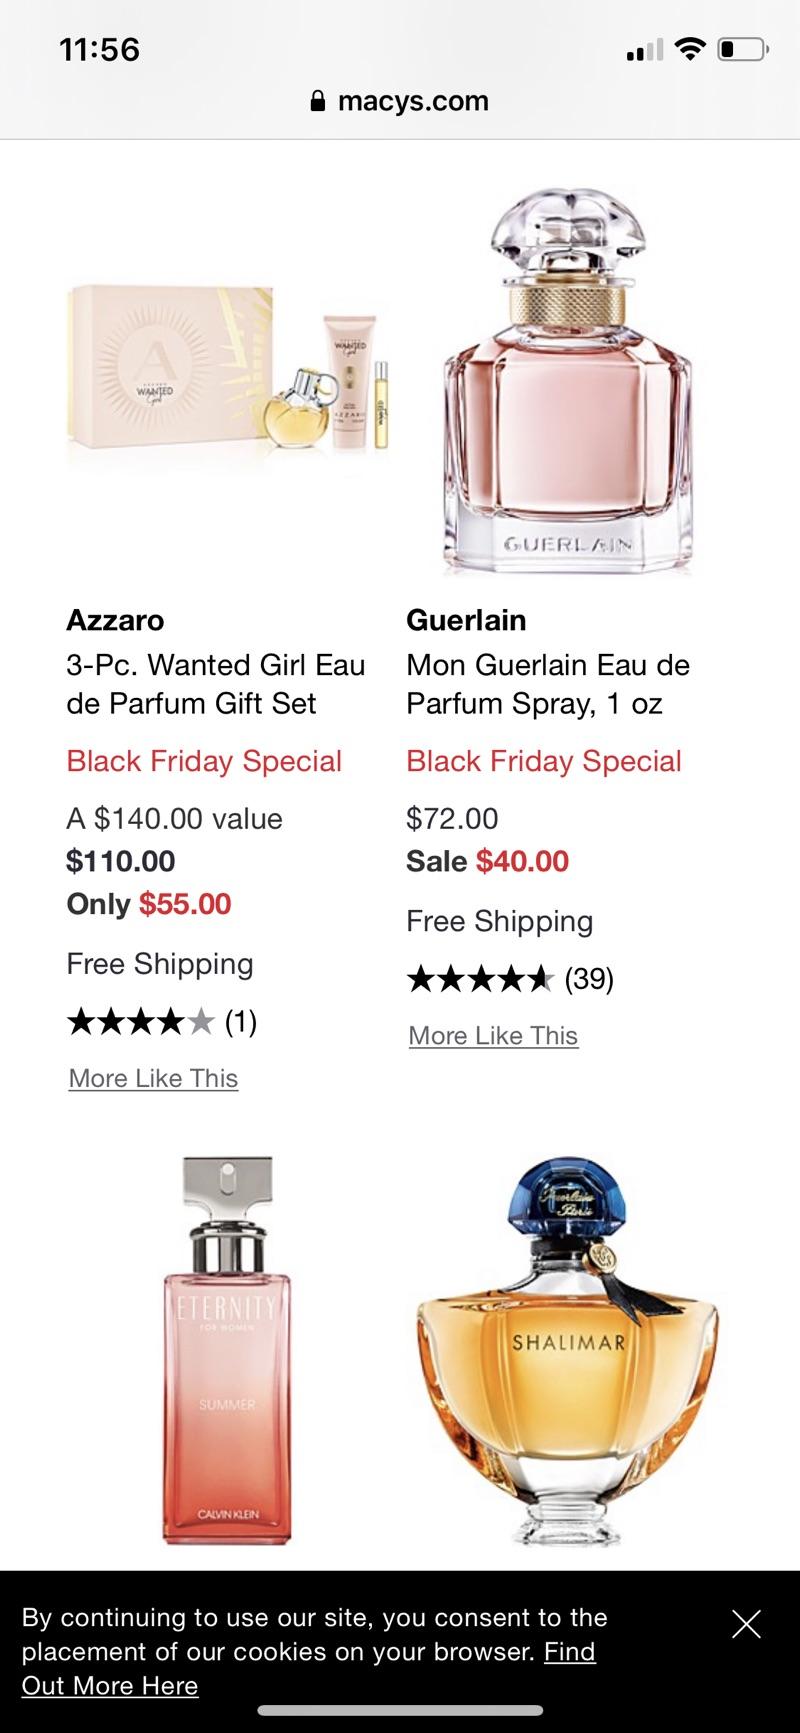 Beauty Fragrances Black Friday Sale & Deals 2020 - Macy's香水地址五折